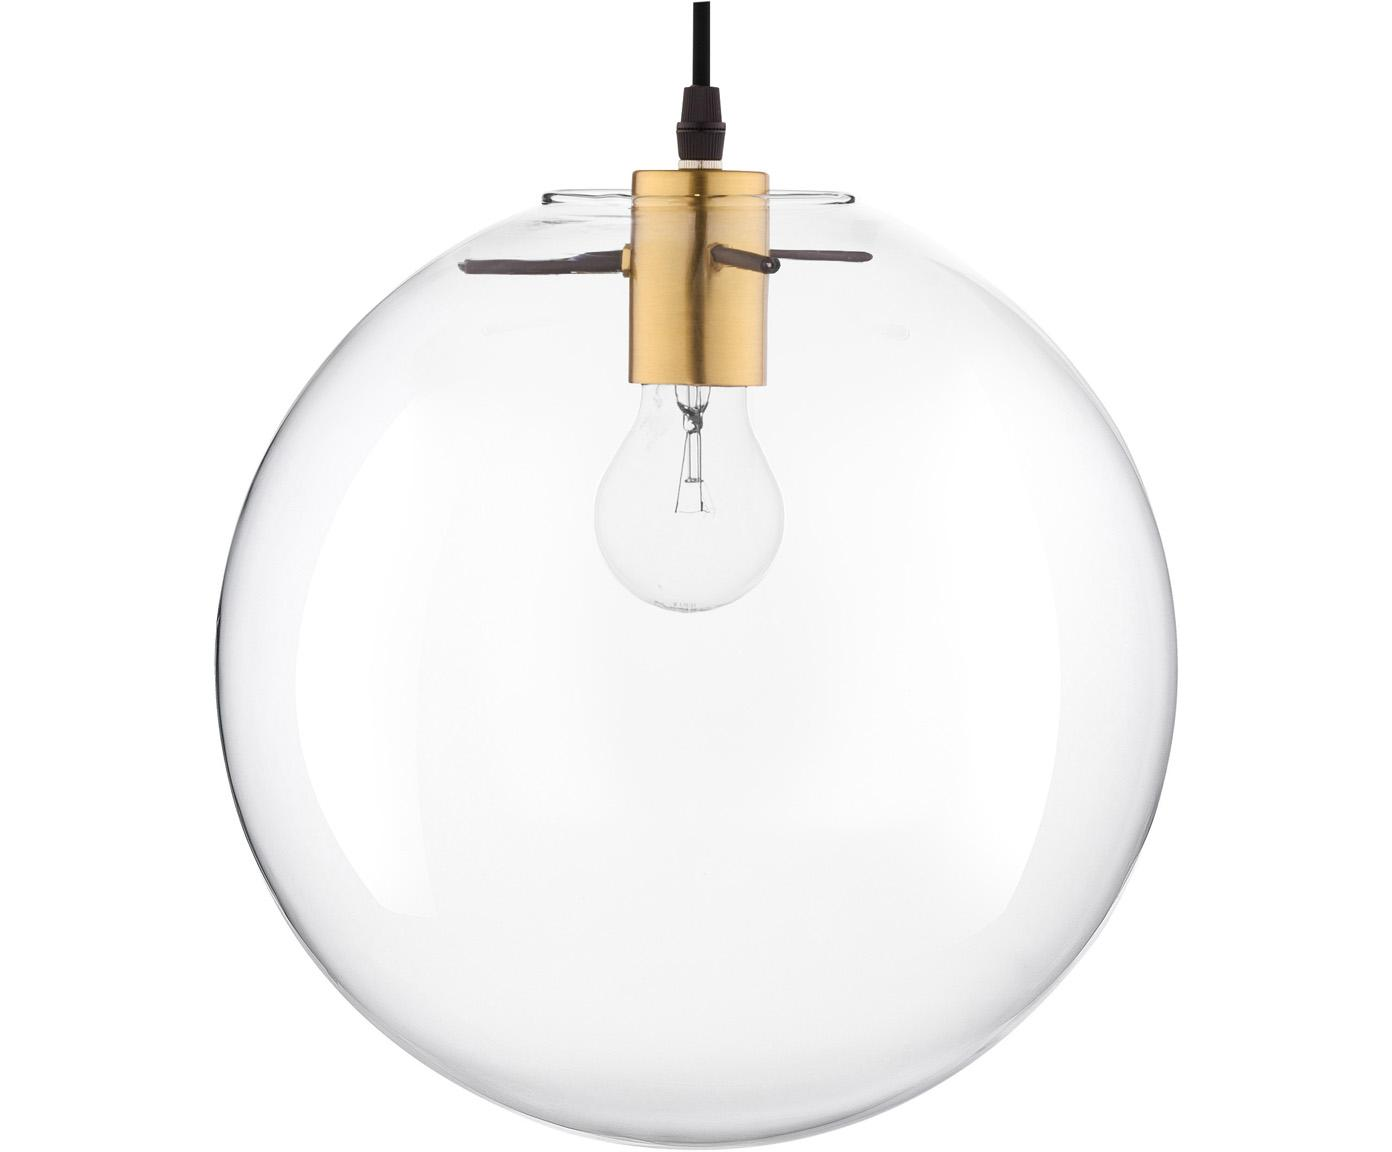 Hanglamp Mirale met glazen lampenkap, Lampenkap: glas, Baldakijn: kunststof, Messingkleurig, transparant, Ø 25 x H 25 cm